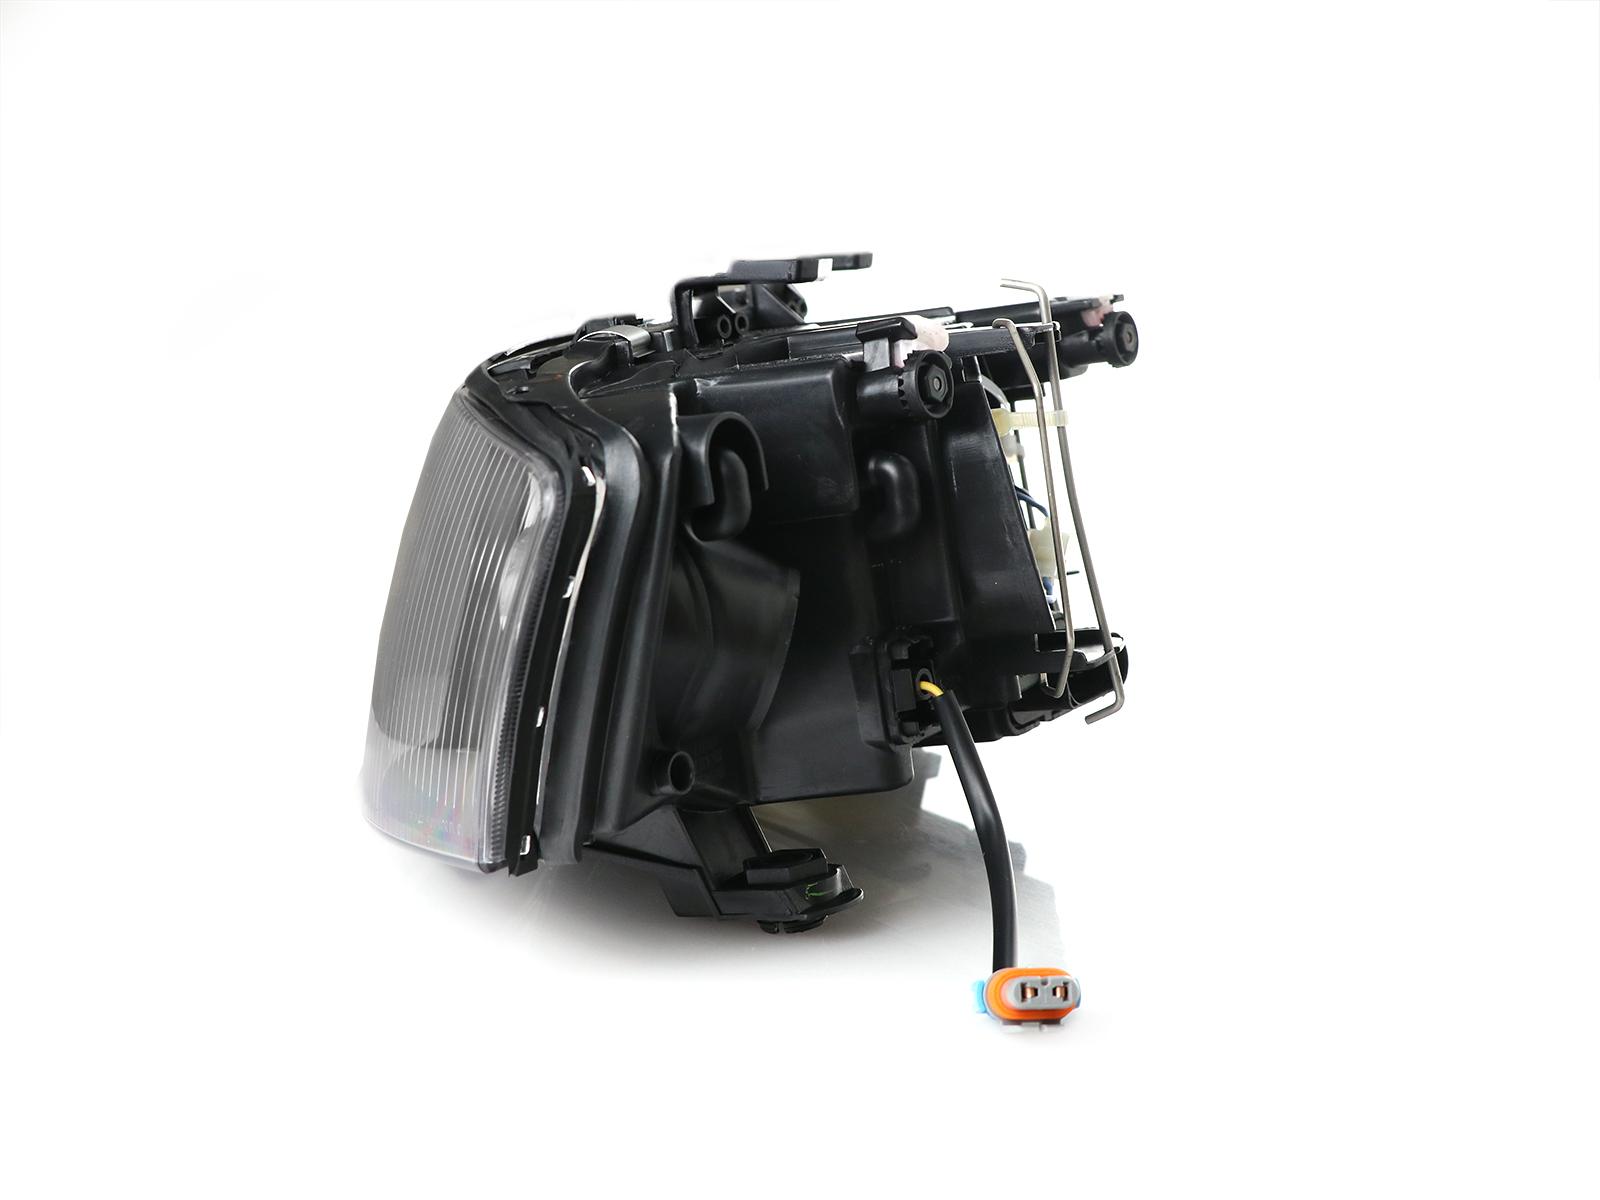 DEPO D2S Xenon HID Blk White LED Halo Projector Headlight